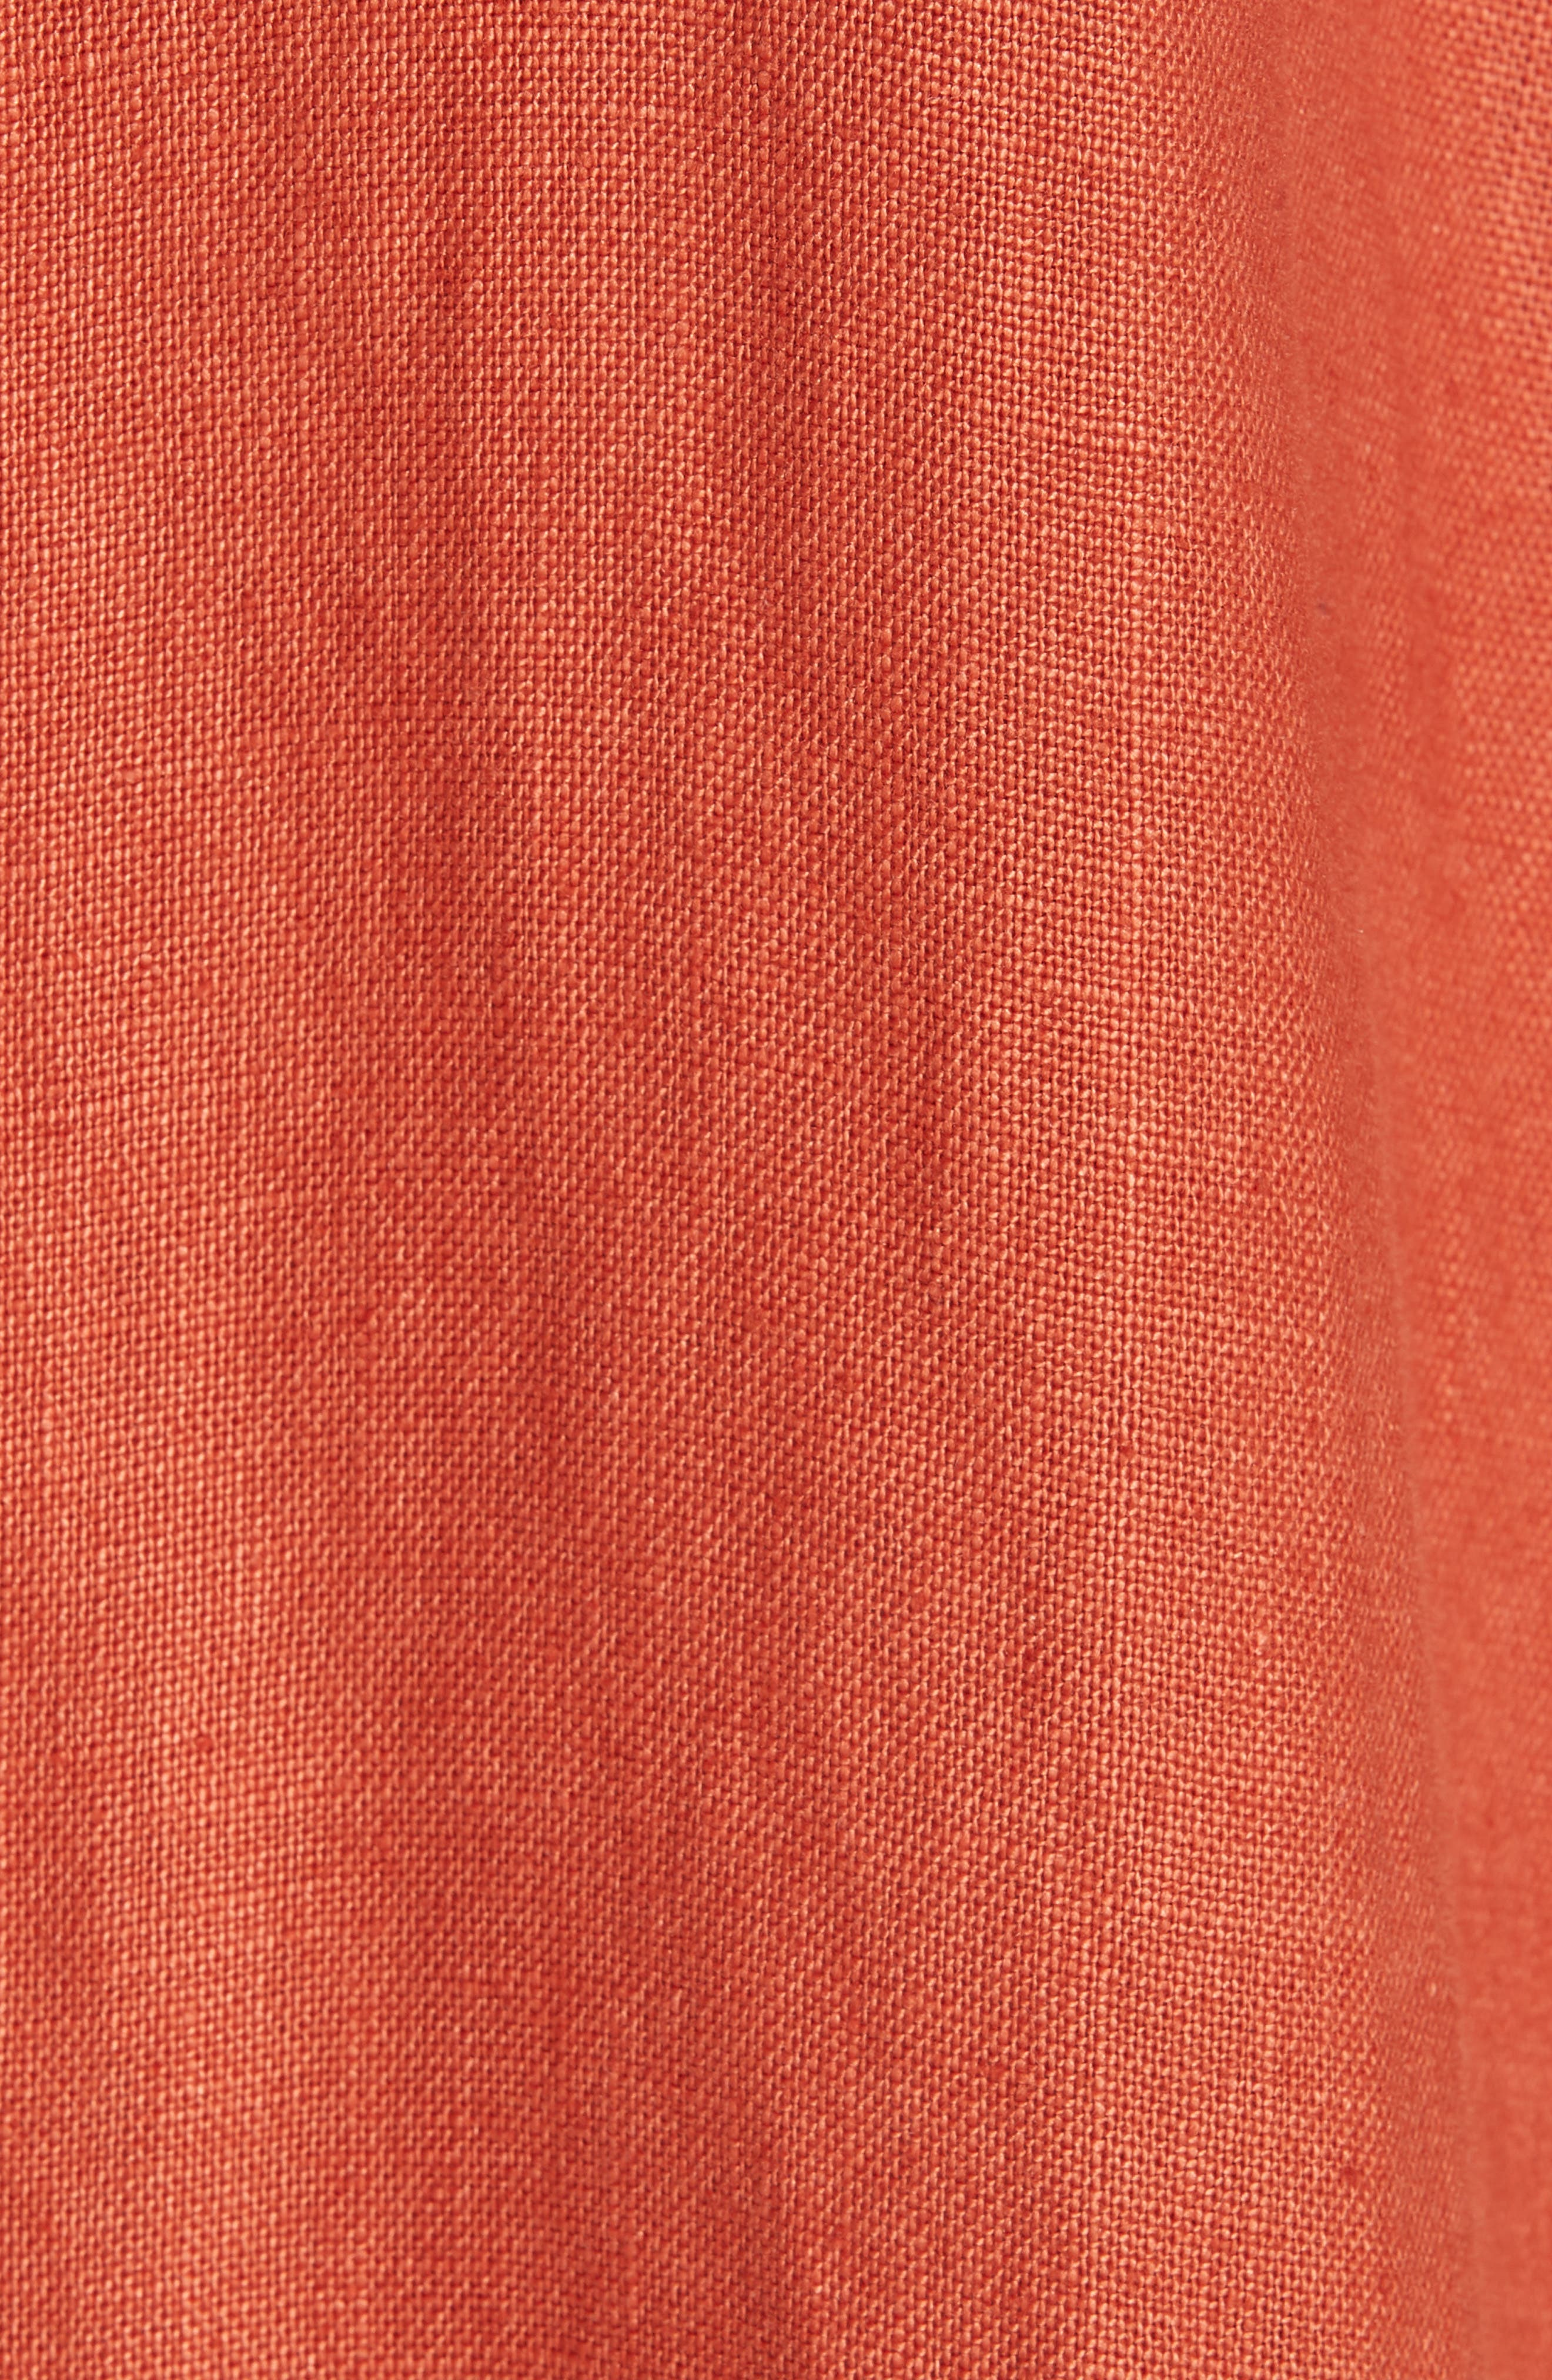 Organic Linen Trench Coat,                             Alternate thumbnail 6, color,                             822